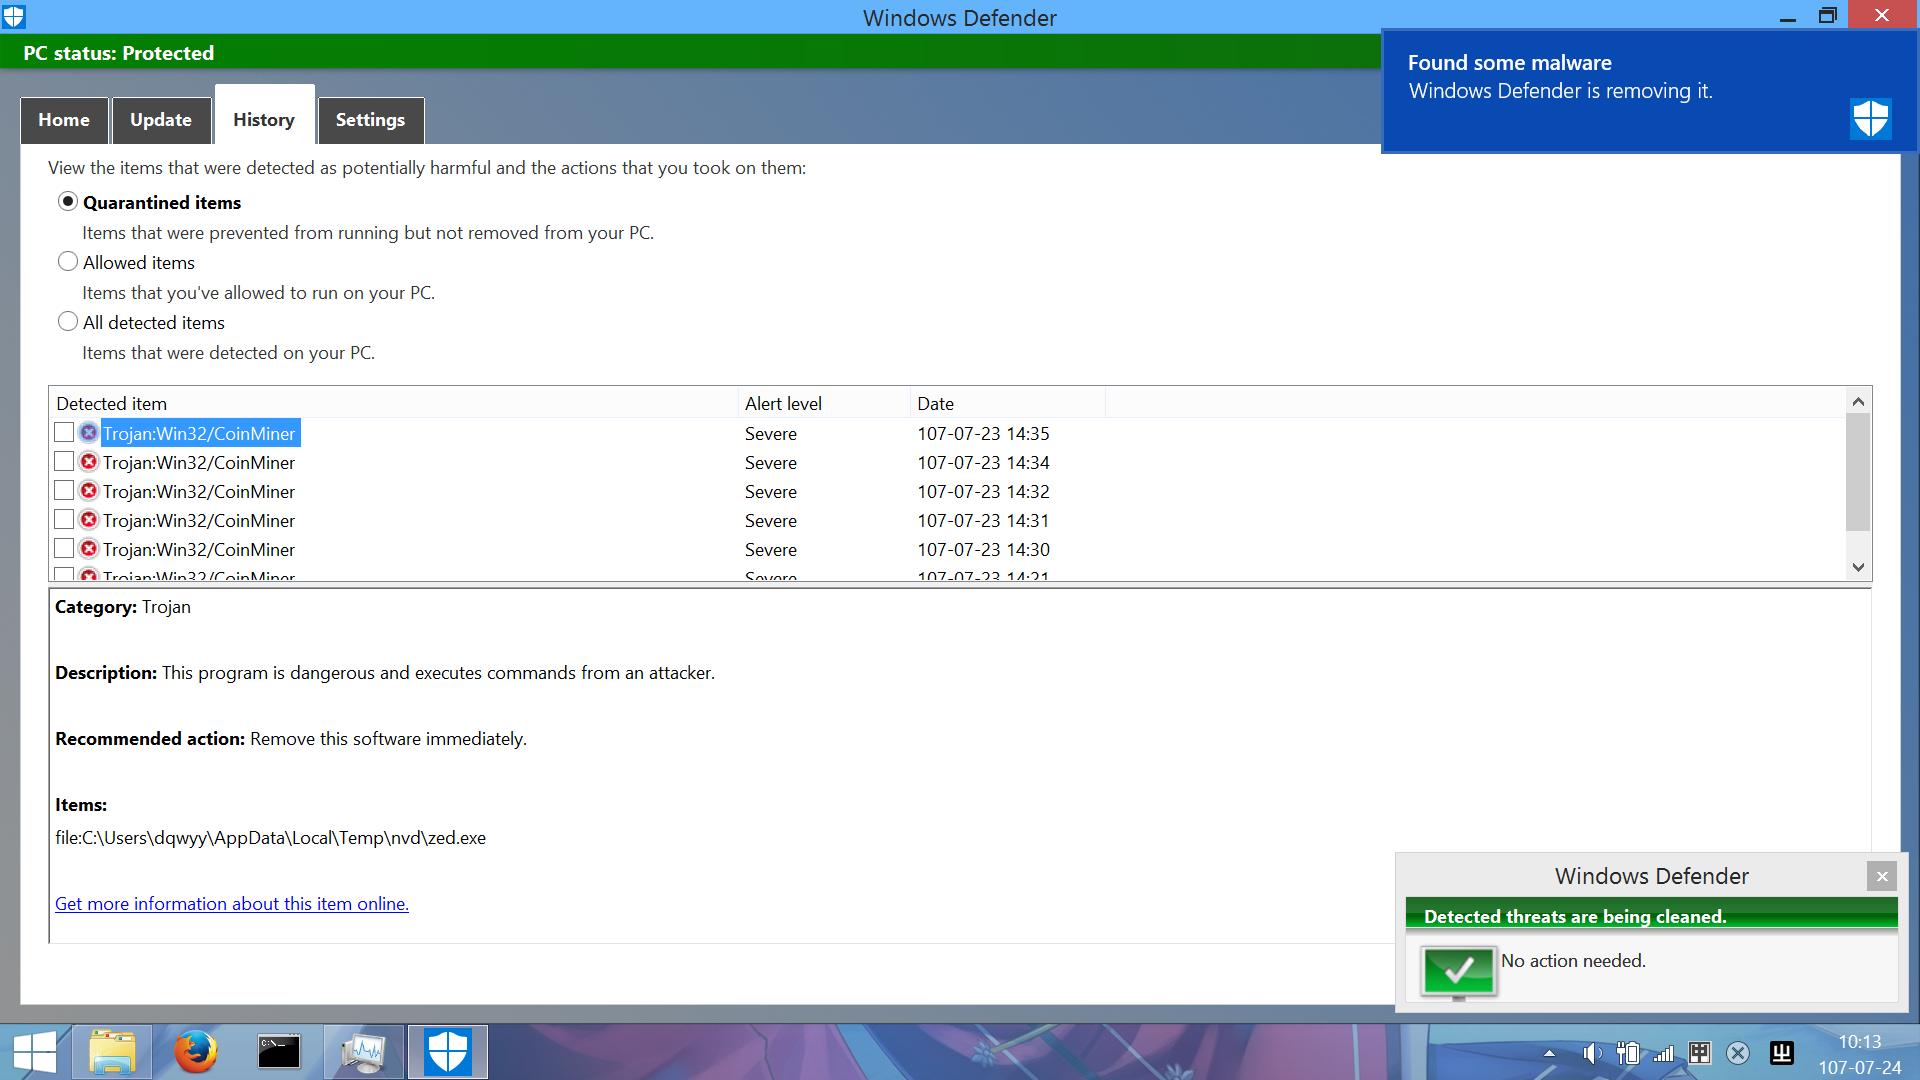 Detected by Windows Defender